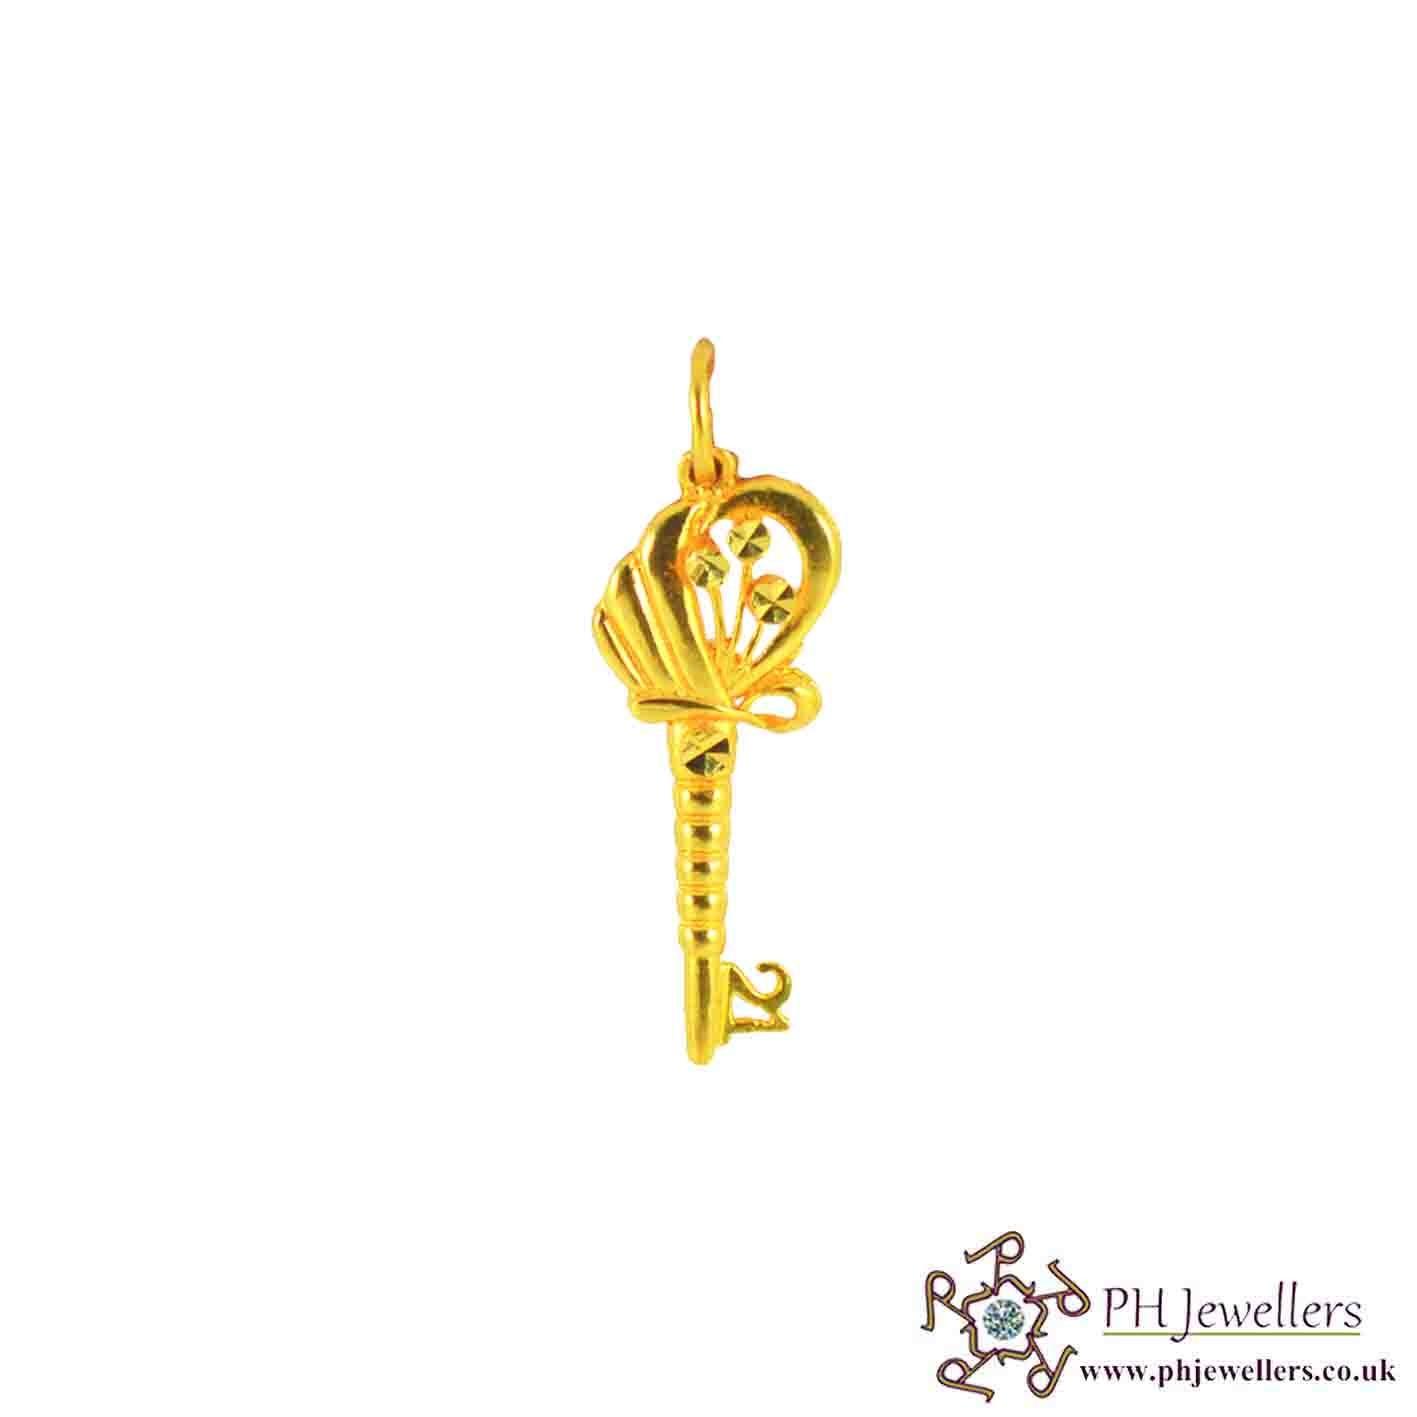 Online gold jewellery gold jewellery fancy 22ct 916 hallmark yellow online gold jewellery gold jewellery fancy 22ct 916 hallmark yellow gold 21 key pendant fp12 22 carat gold jewellers aloadofball Gallery